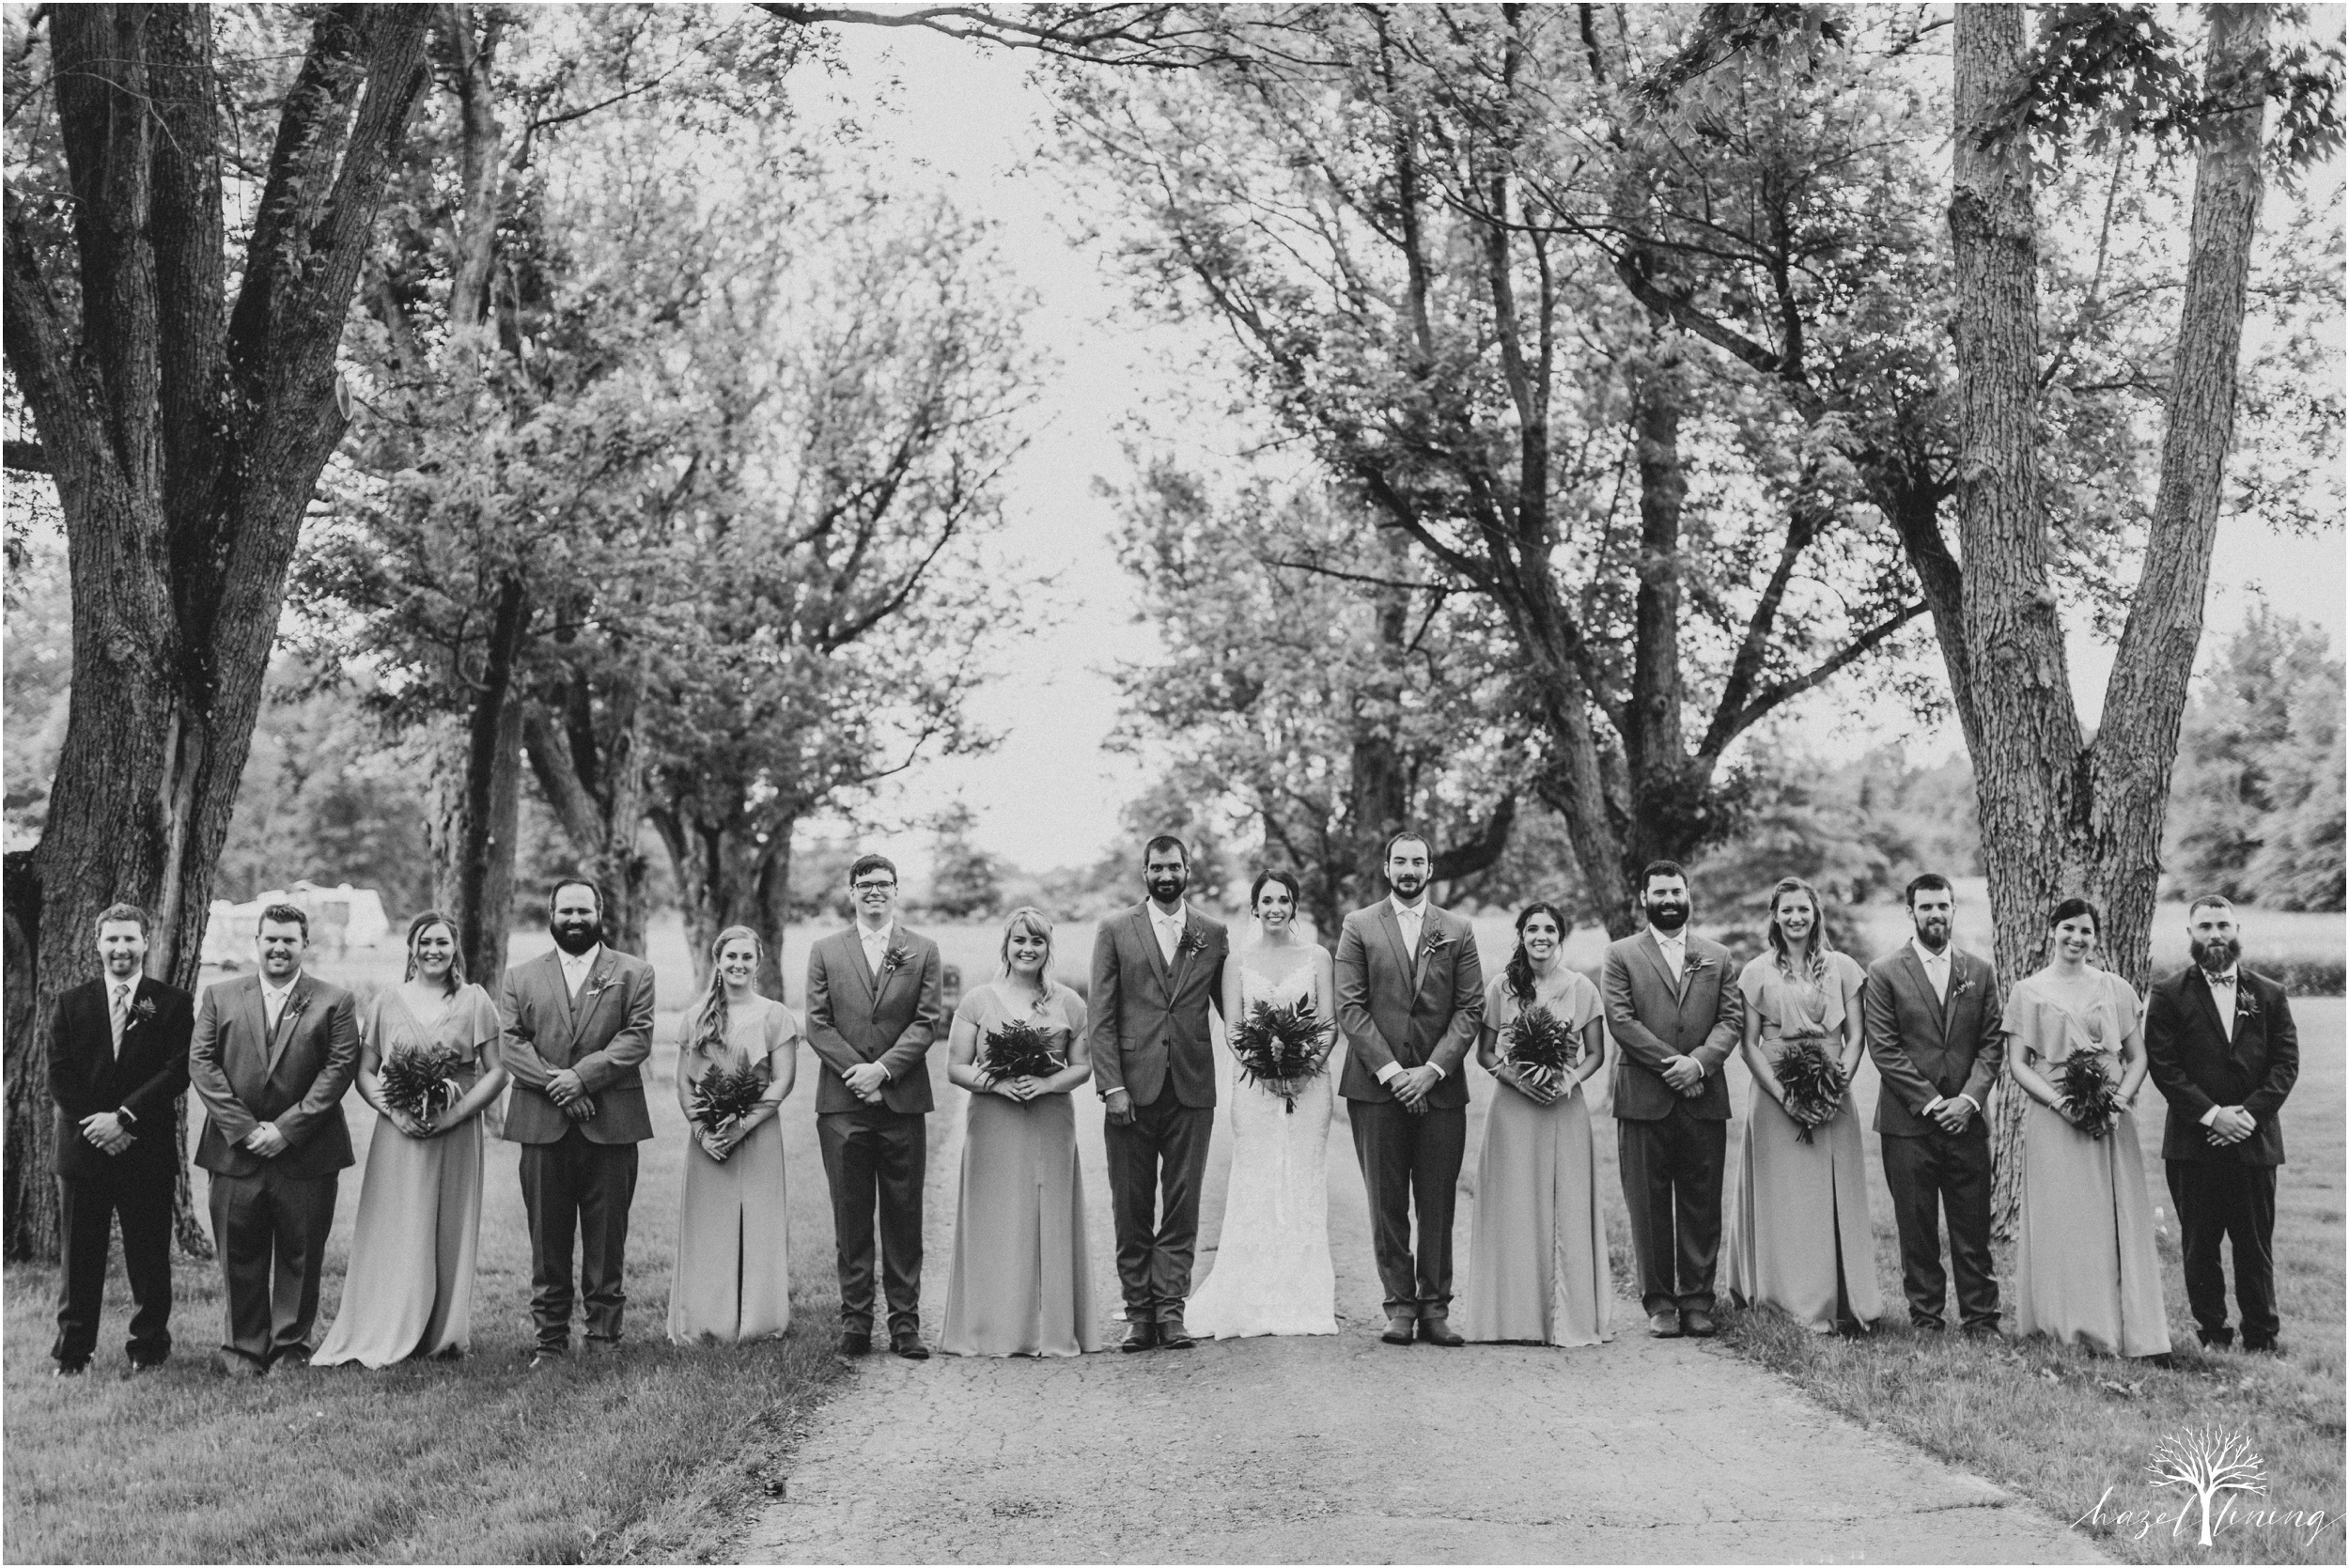 hazel-lining-travel-wedding-elopement-photography-lisa-landon-shoemaker-the-farm-bakery-and-events-bucks-county-quakertown-pennsylvania-summer-country-outdoor-farm-wedding_0080.jpg